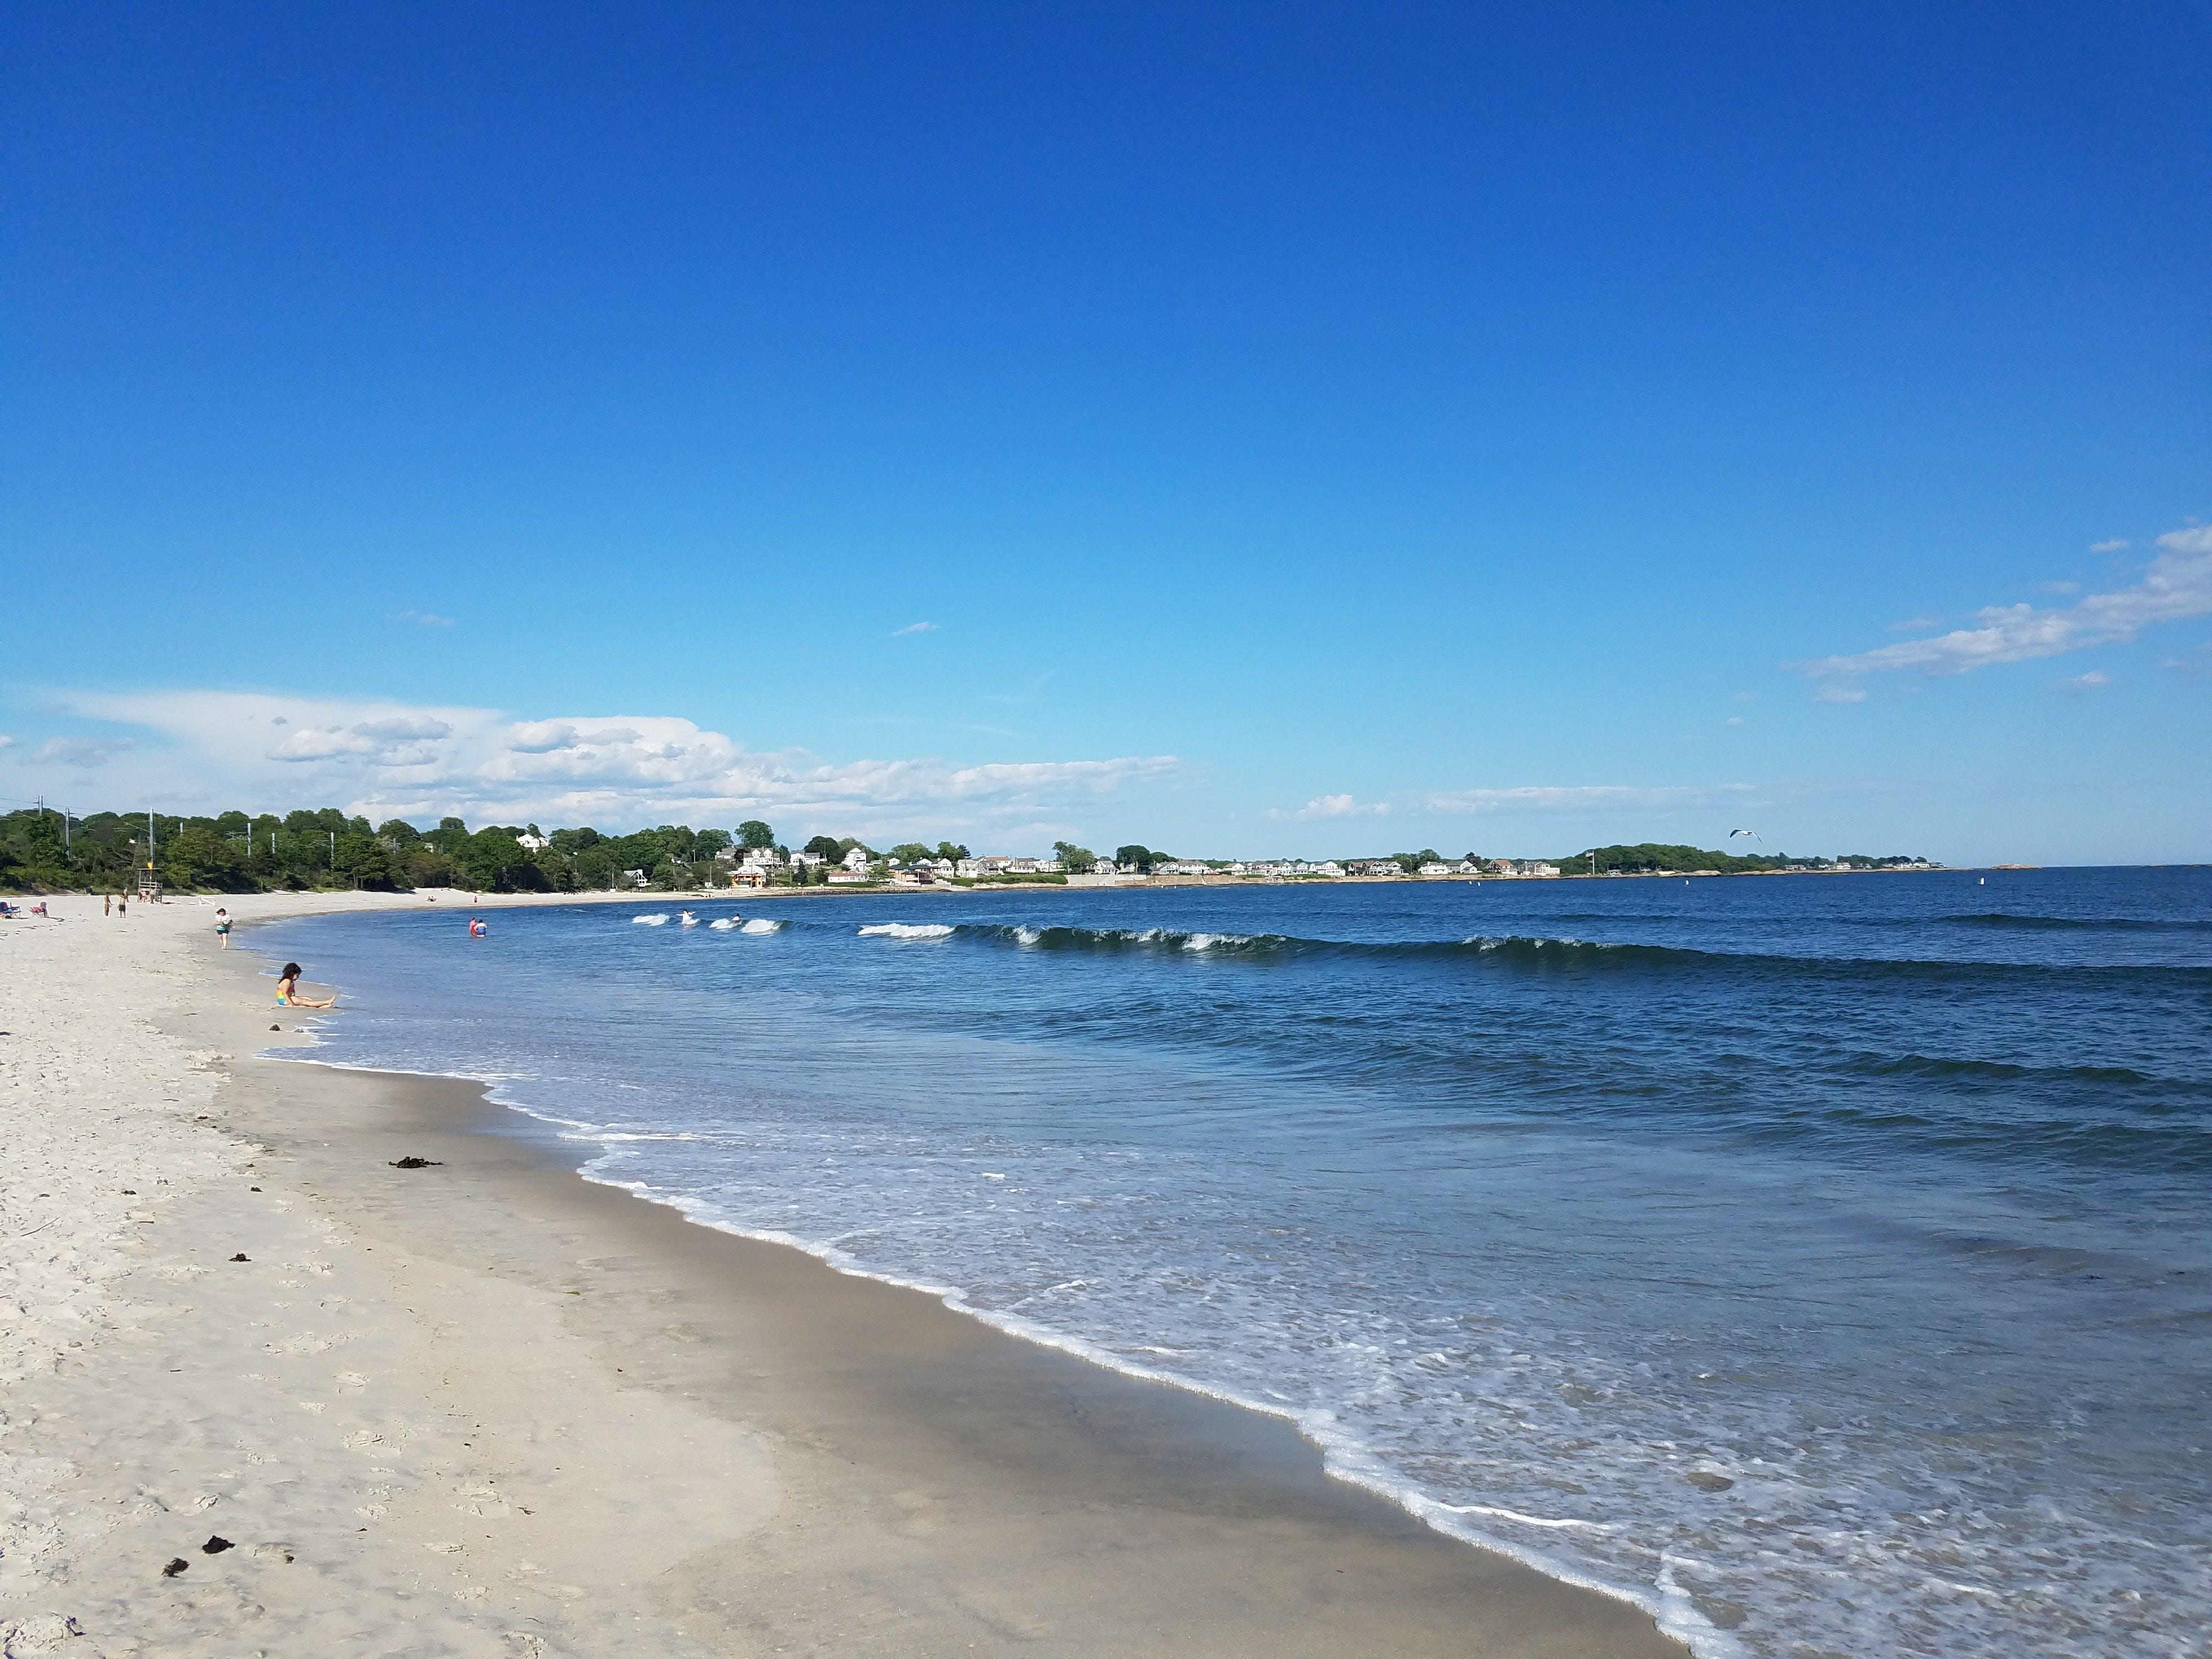 a connecticut beach on a clear, blue day